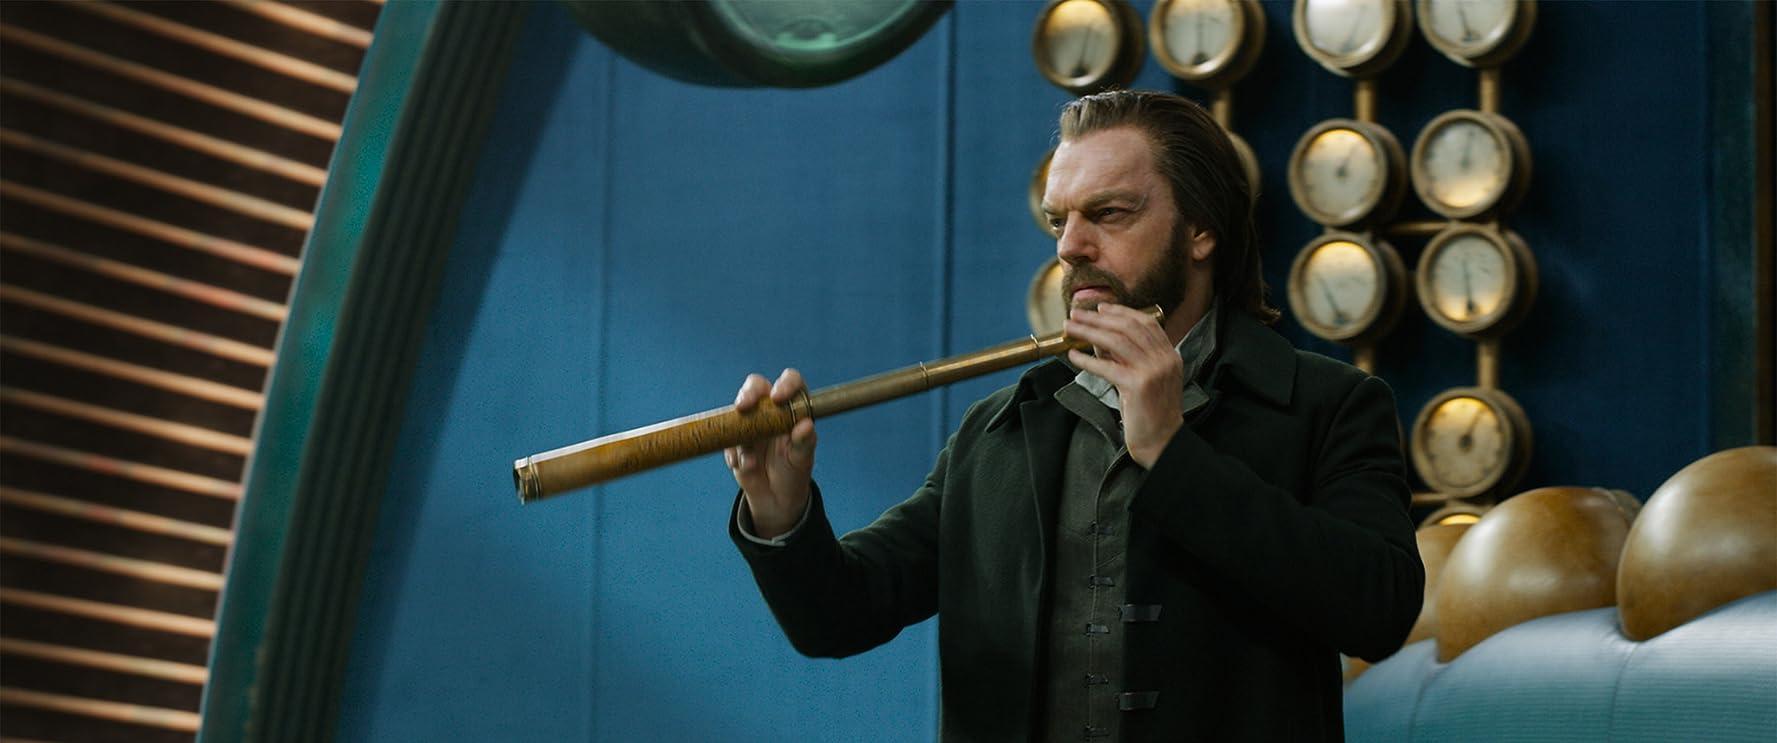 Hugo Weaving in Mortal Engines / IMDB.com